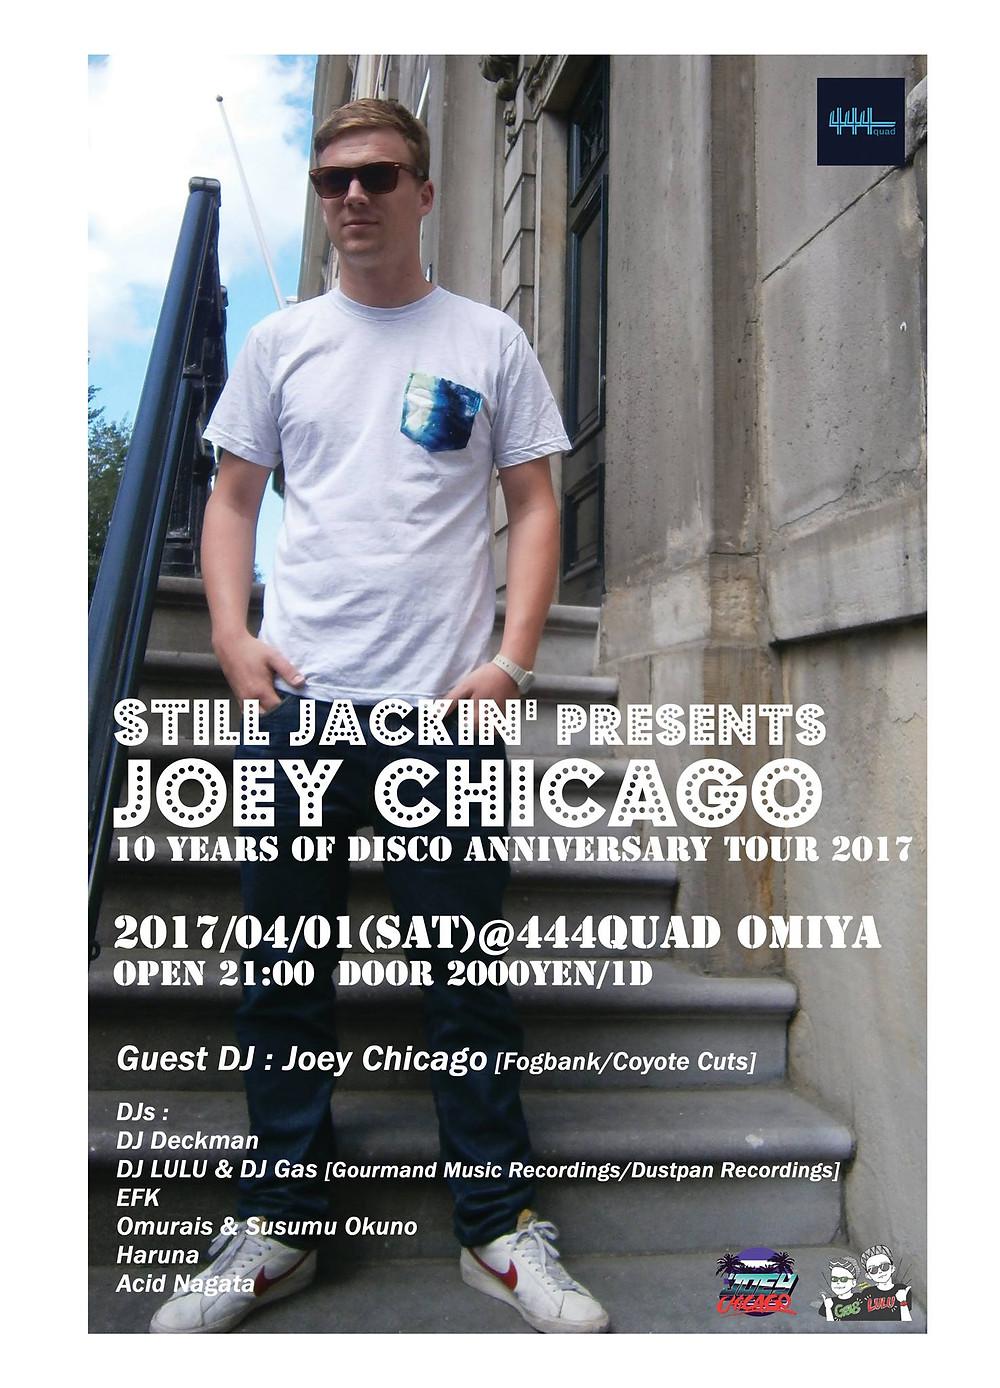 Still Jackin' Presents Joey Chicago